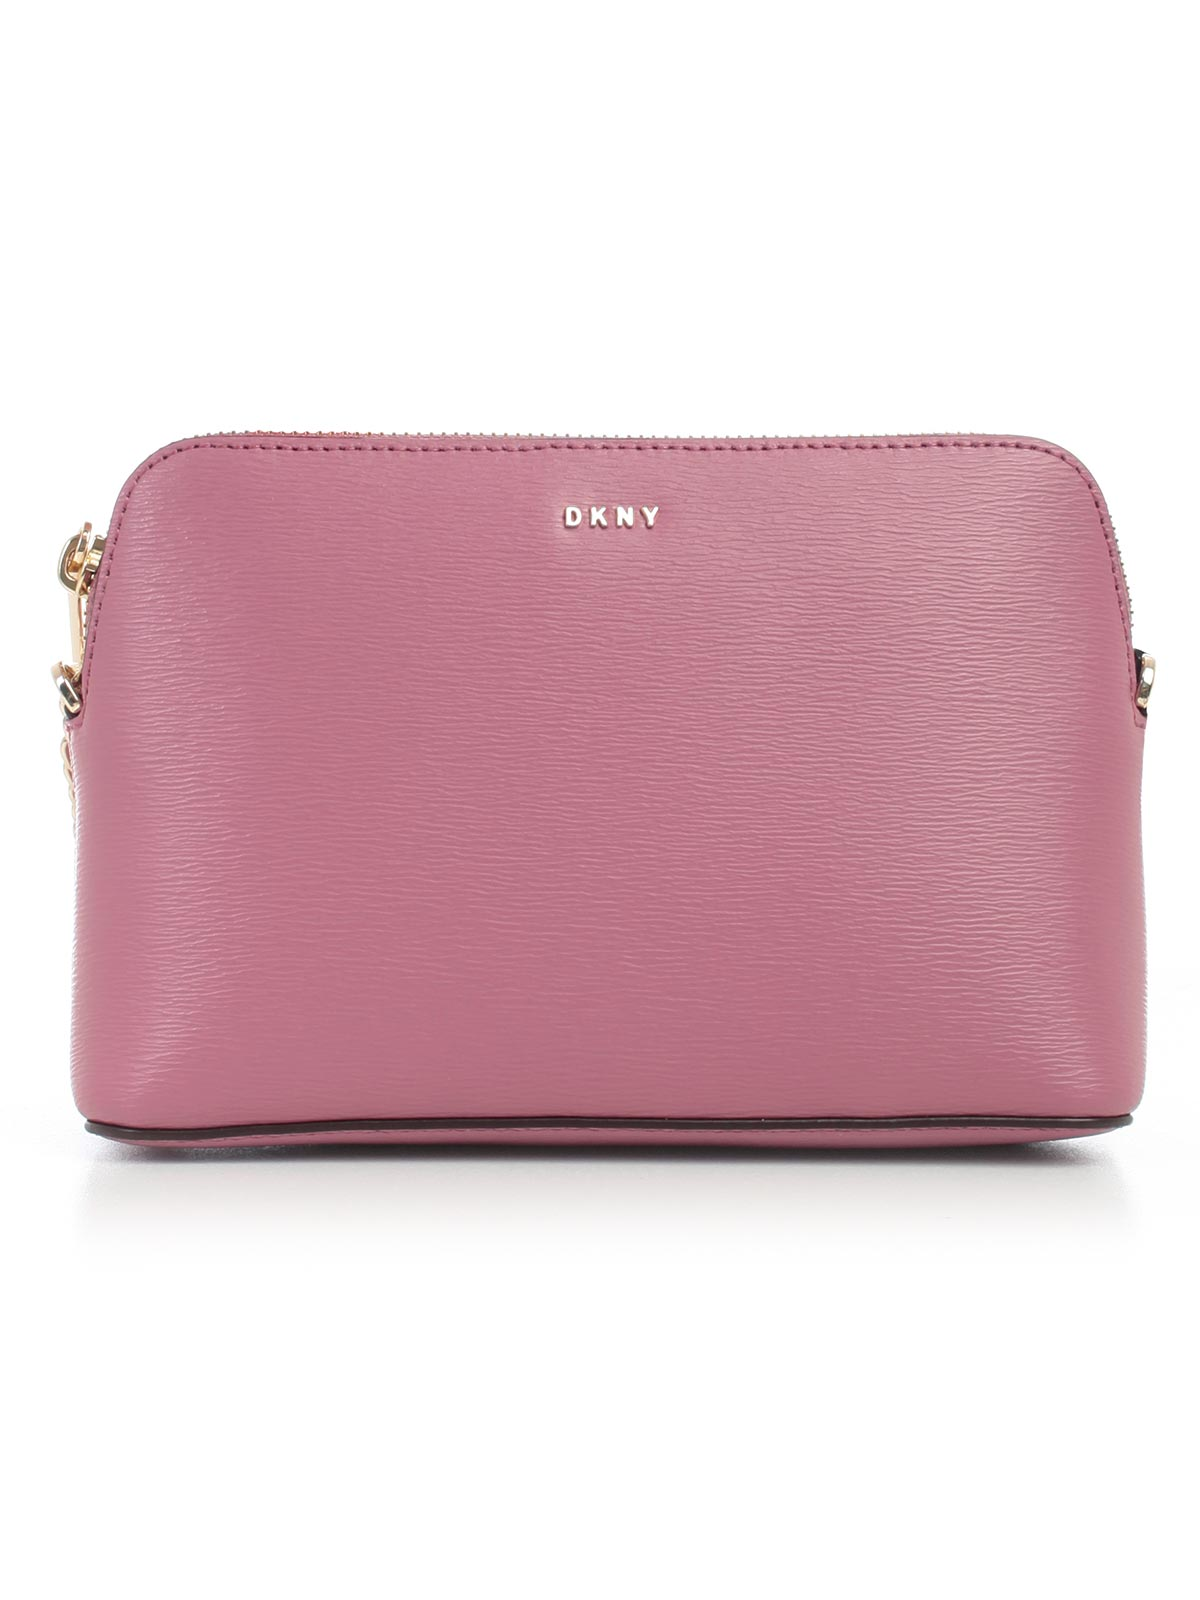 9a5813deda0 Dkny Bags R83E3655|085 - 0CR CANYON ROSE.Bernardelli Store - Online ...